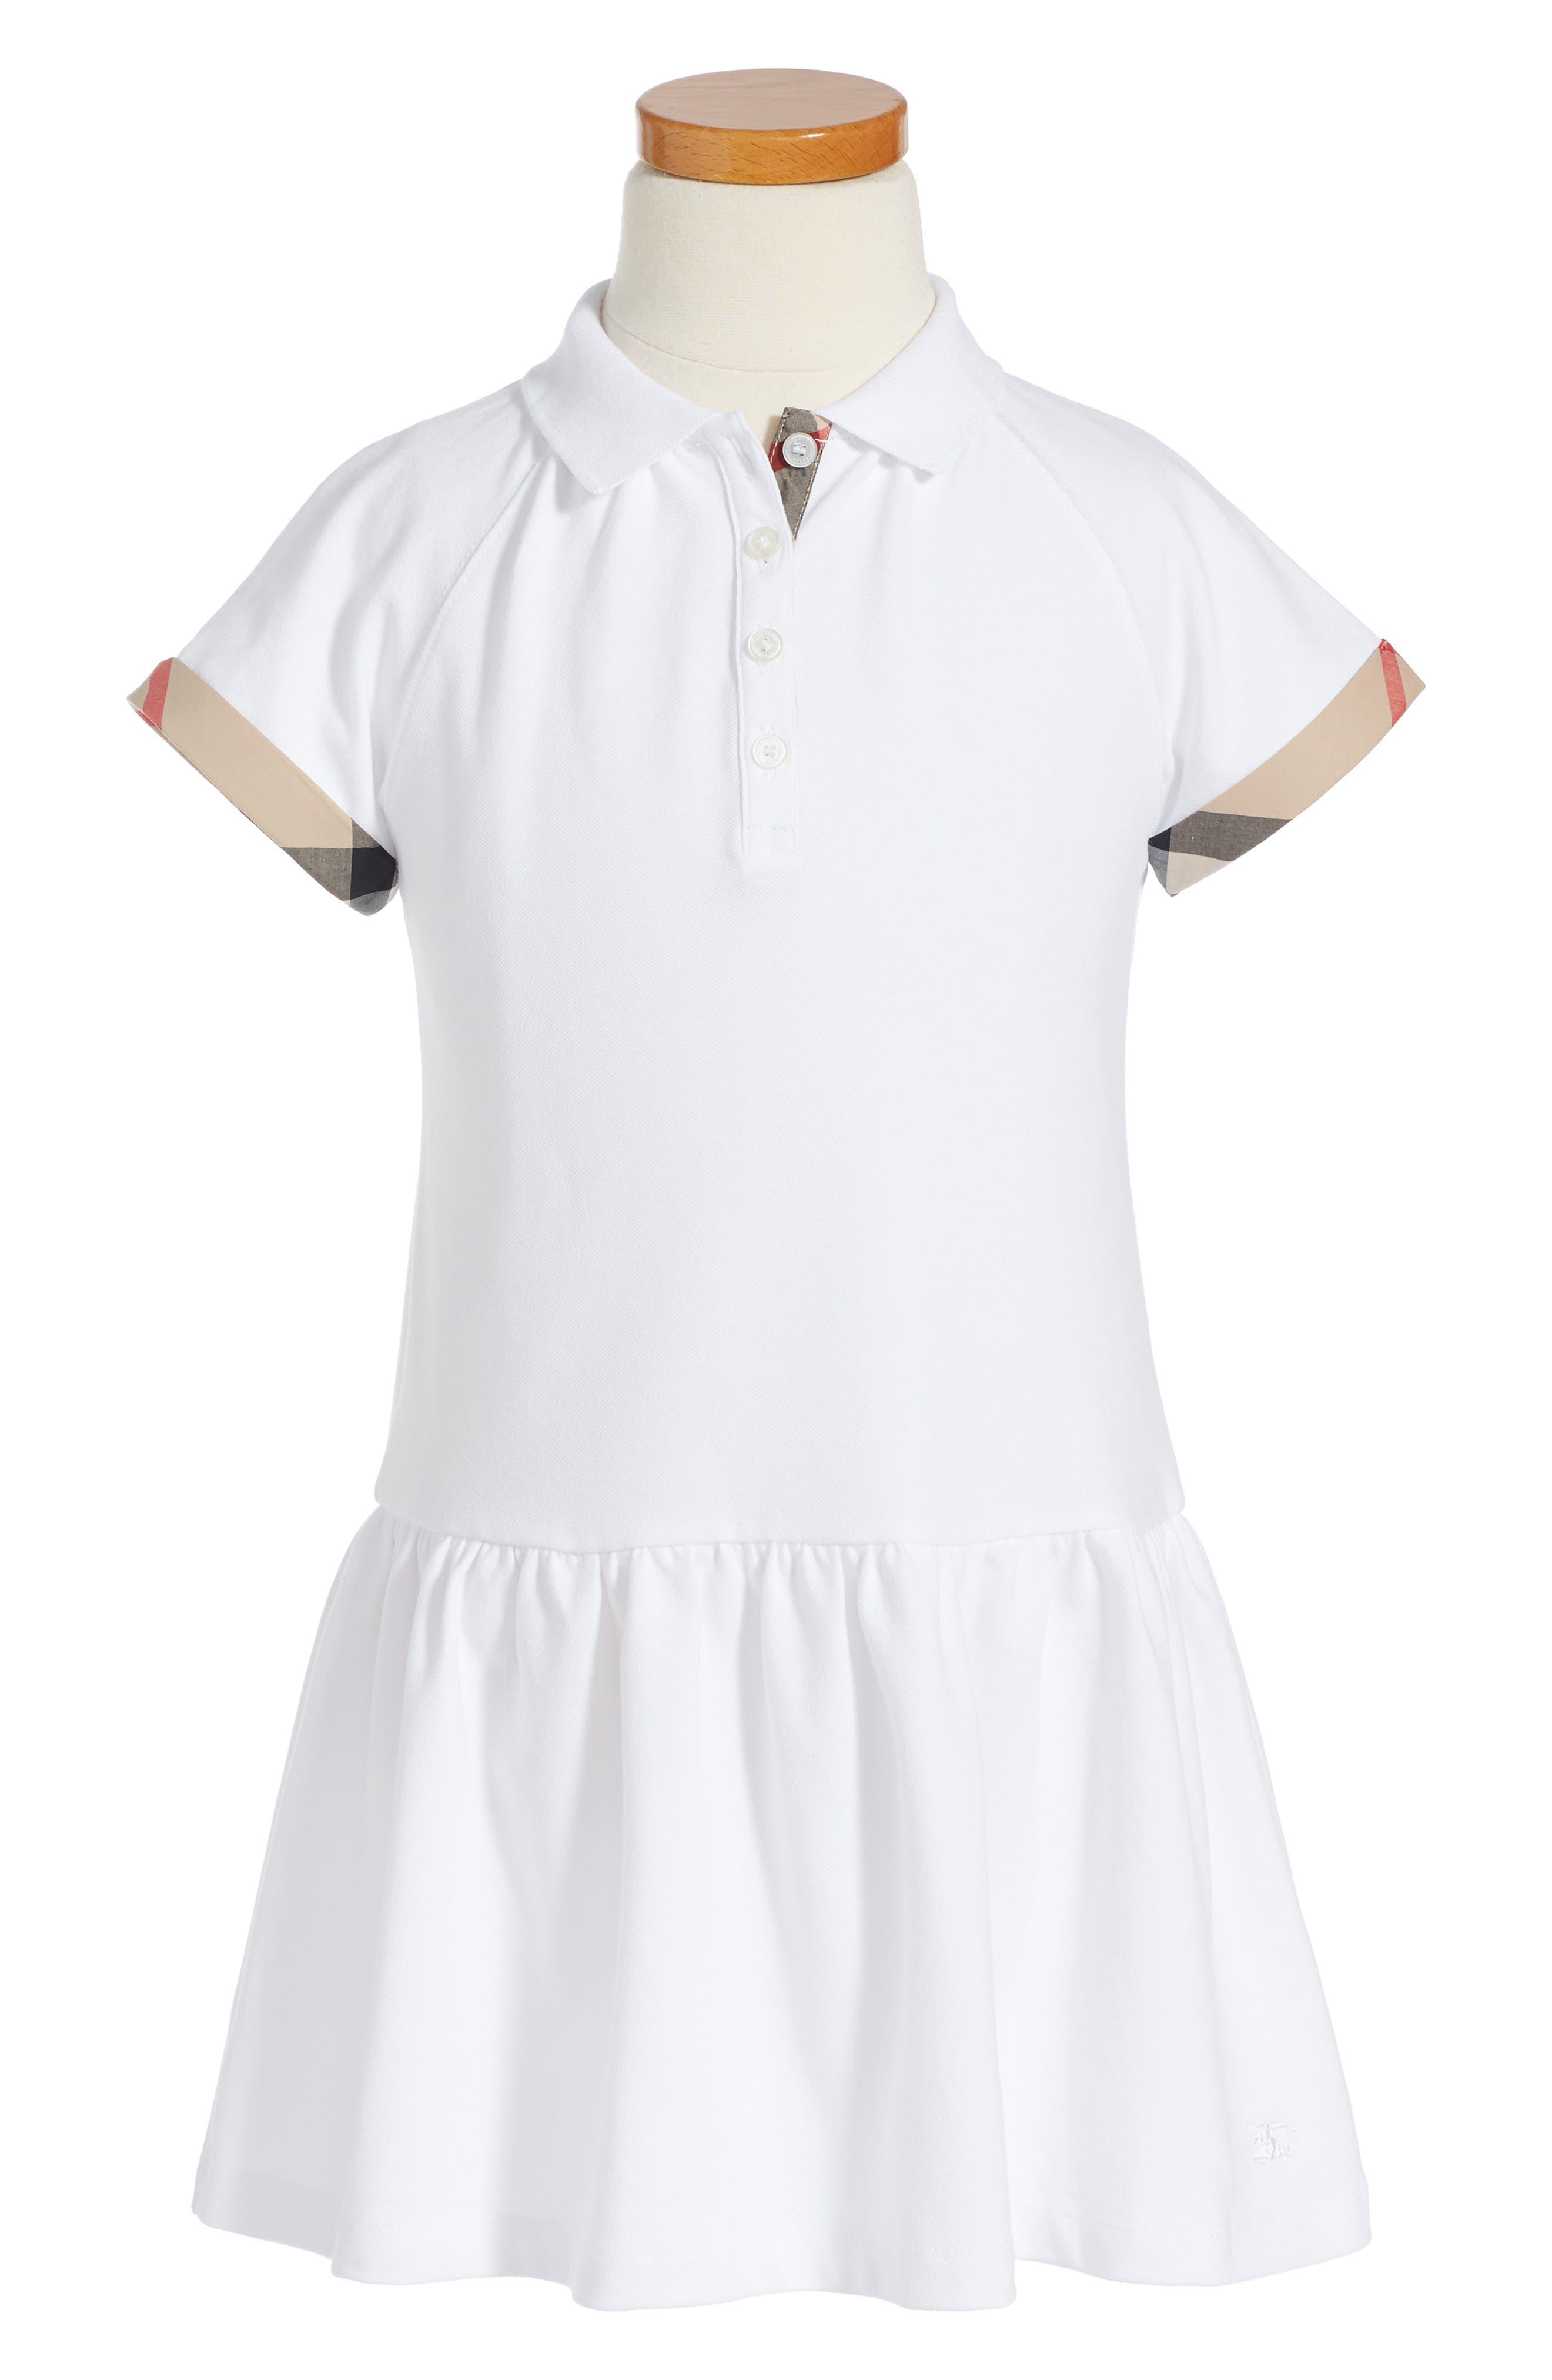 Main Image - Burberry Cali Dress (Little Girls & Big Girls)